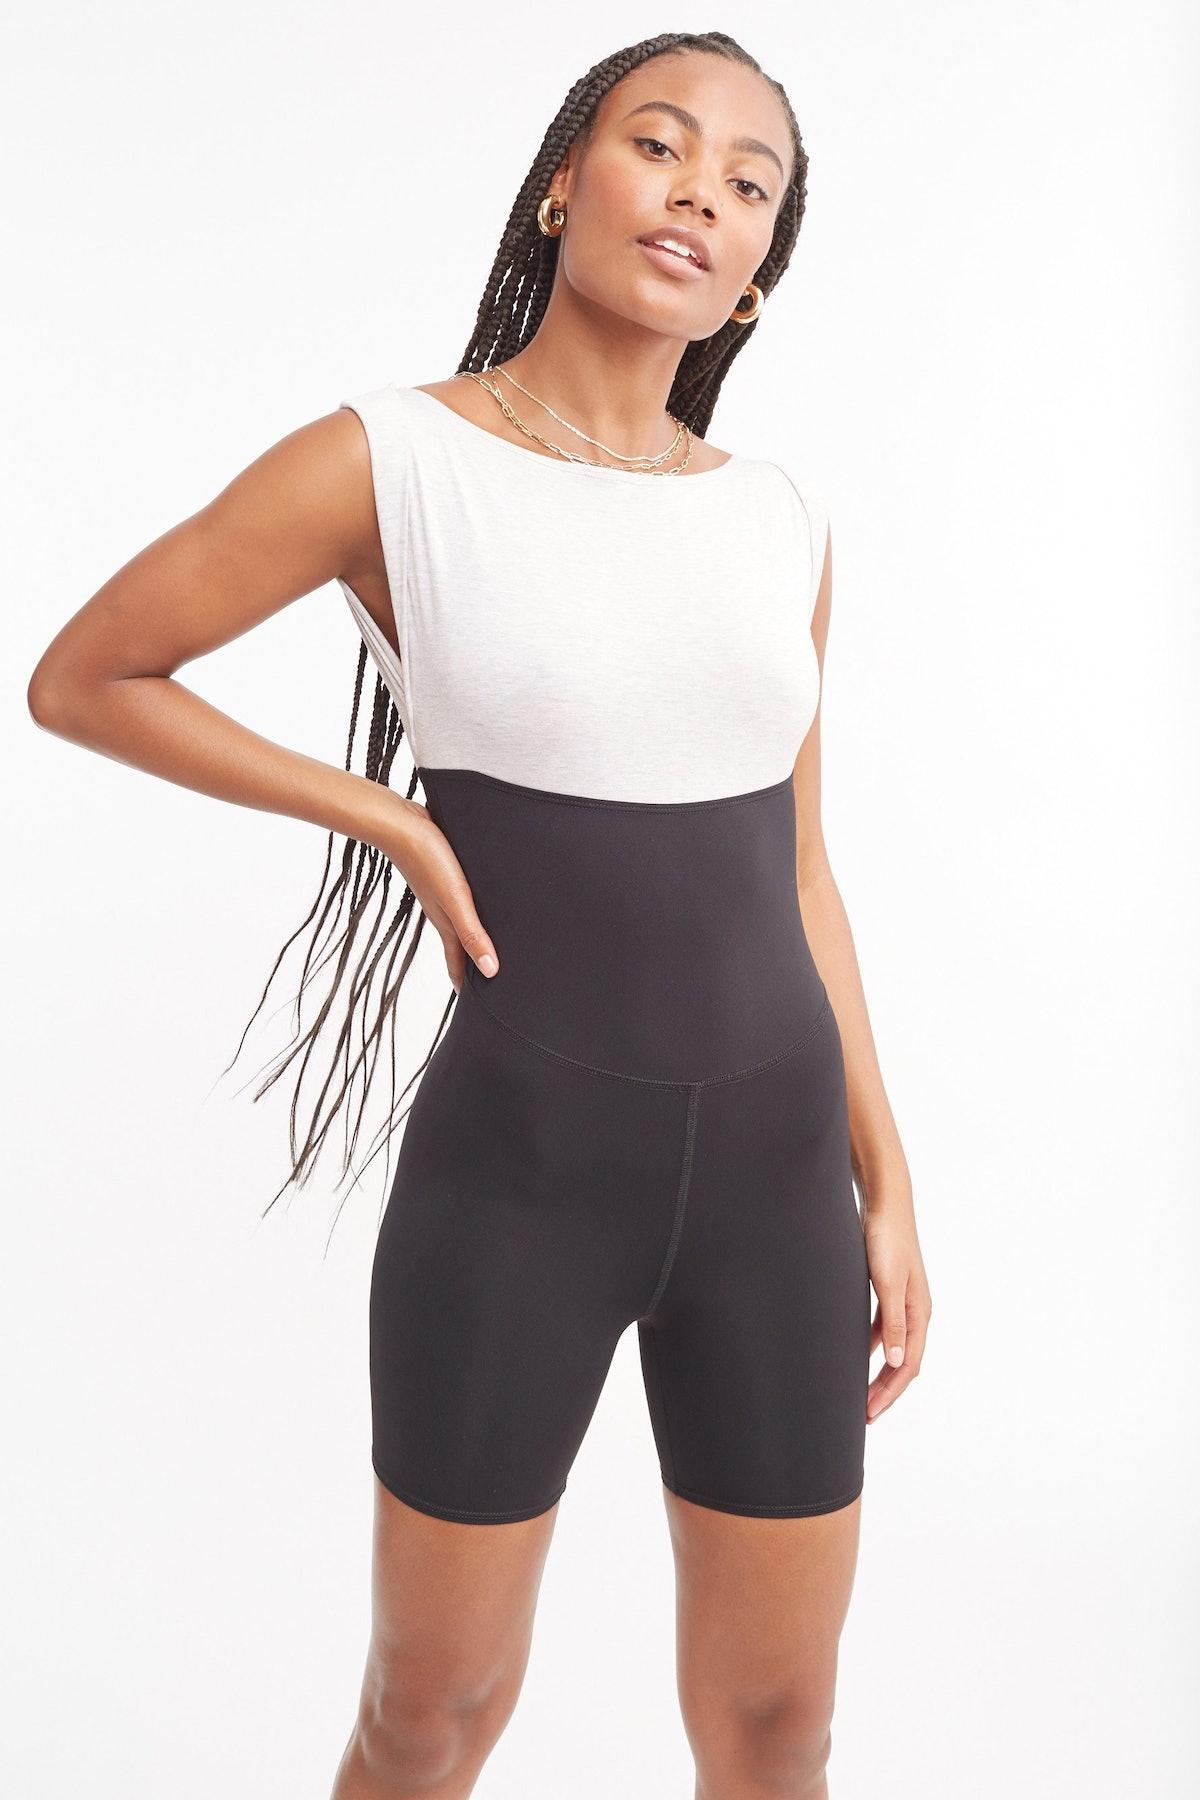 Tropic of C Movement colorblock barre bodysuit